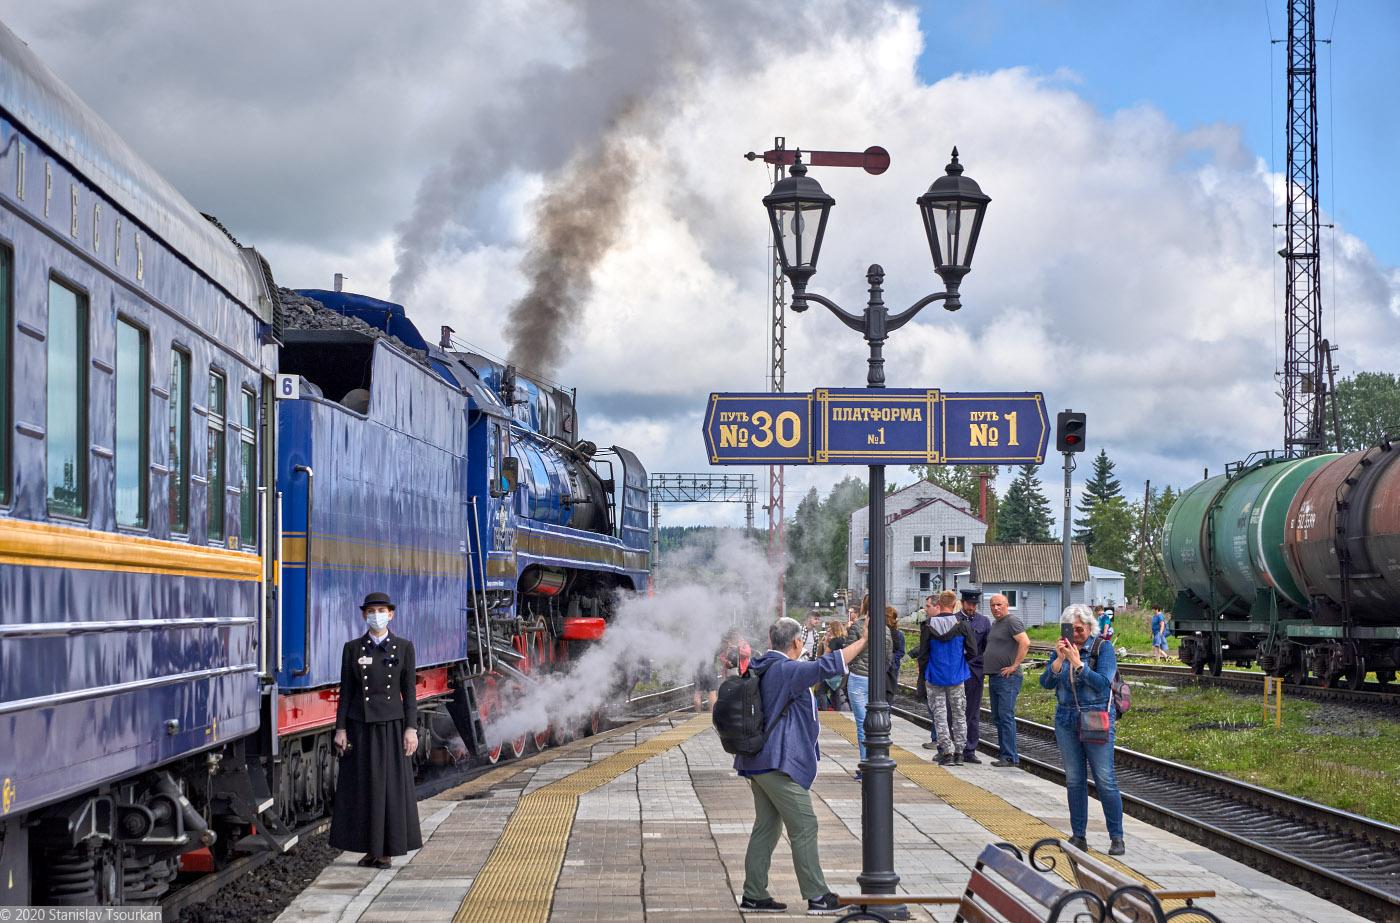 Карелия, республика Карелия, Сортавала, russia, karjala, sortavala, станция сортавала, железная дорога, семафор